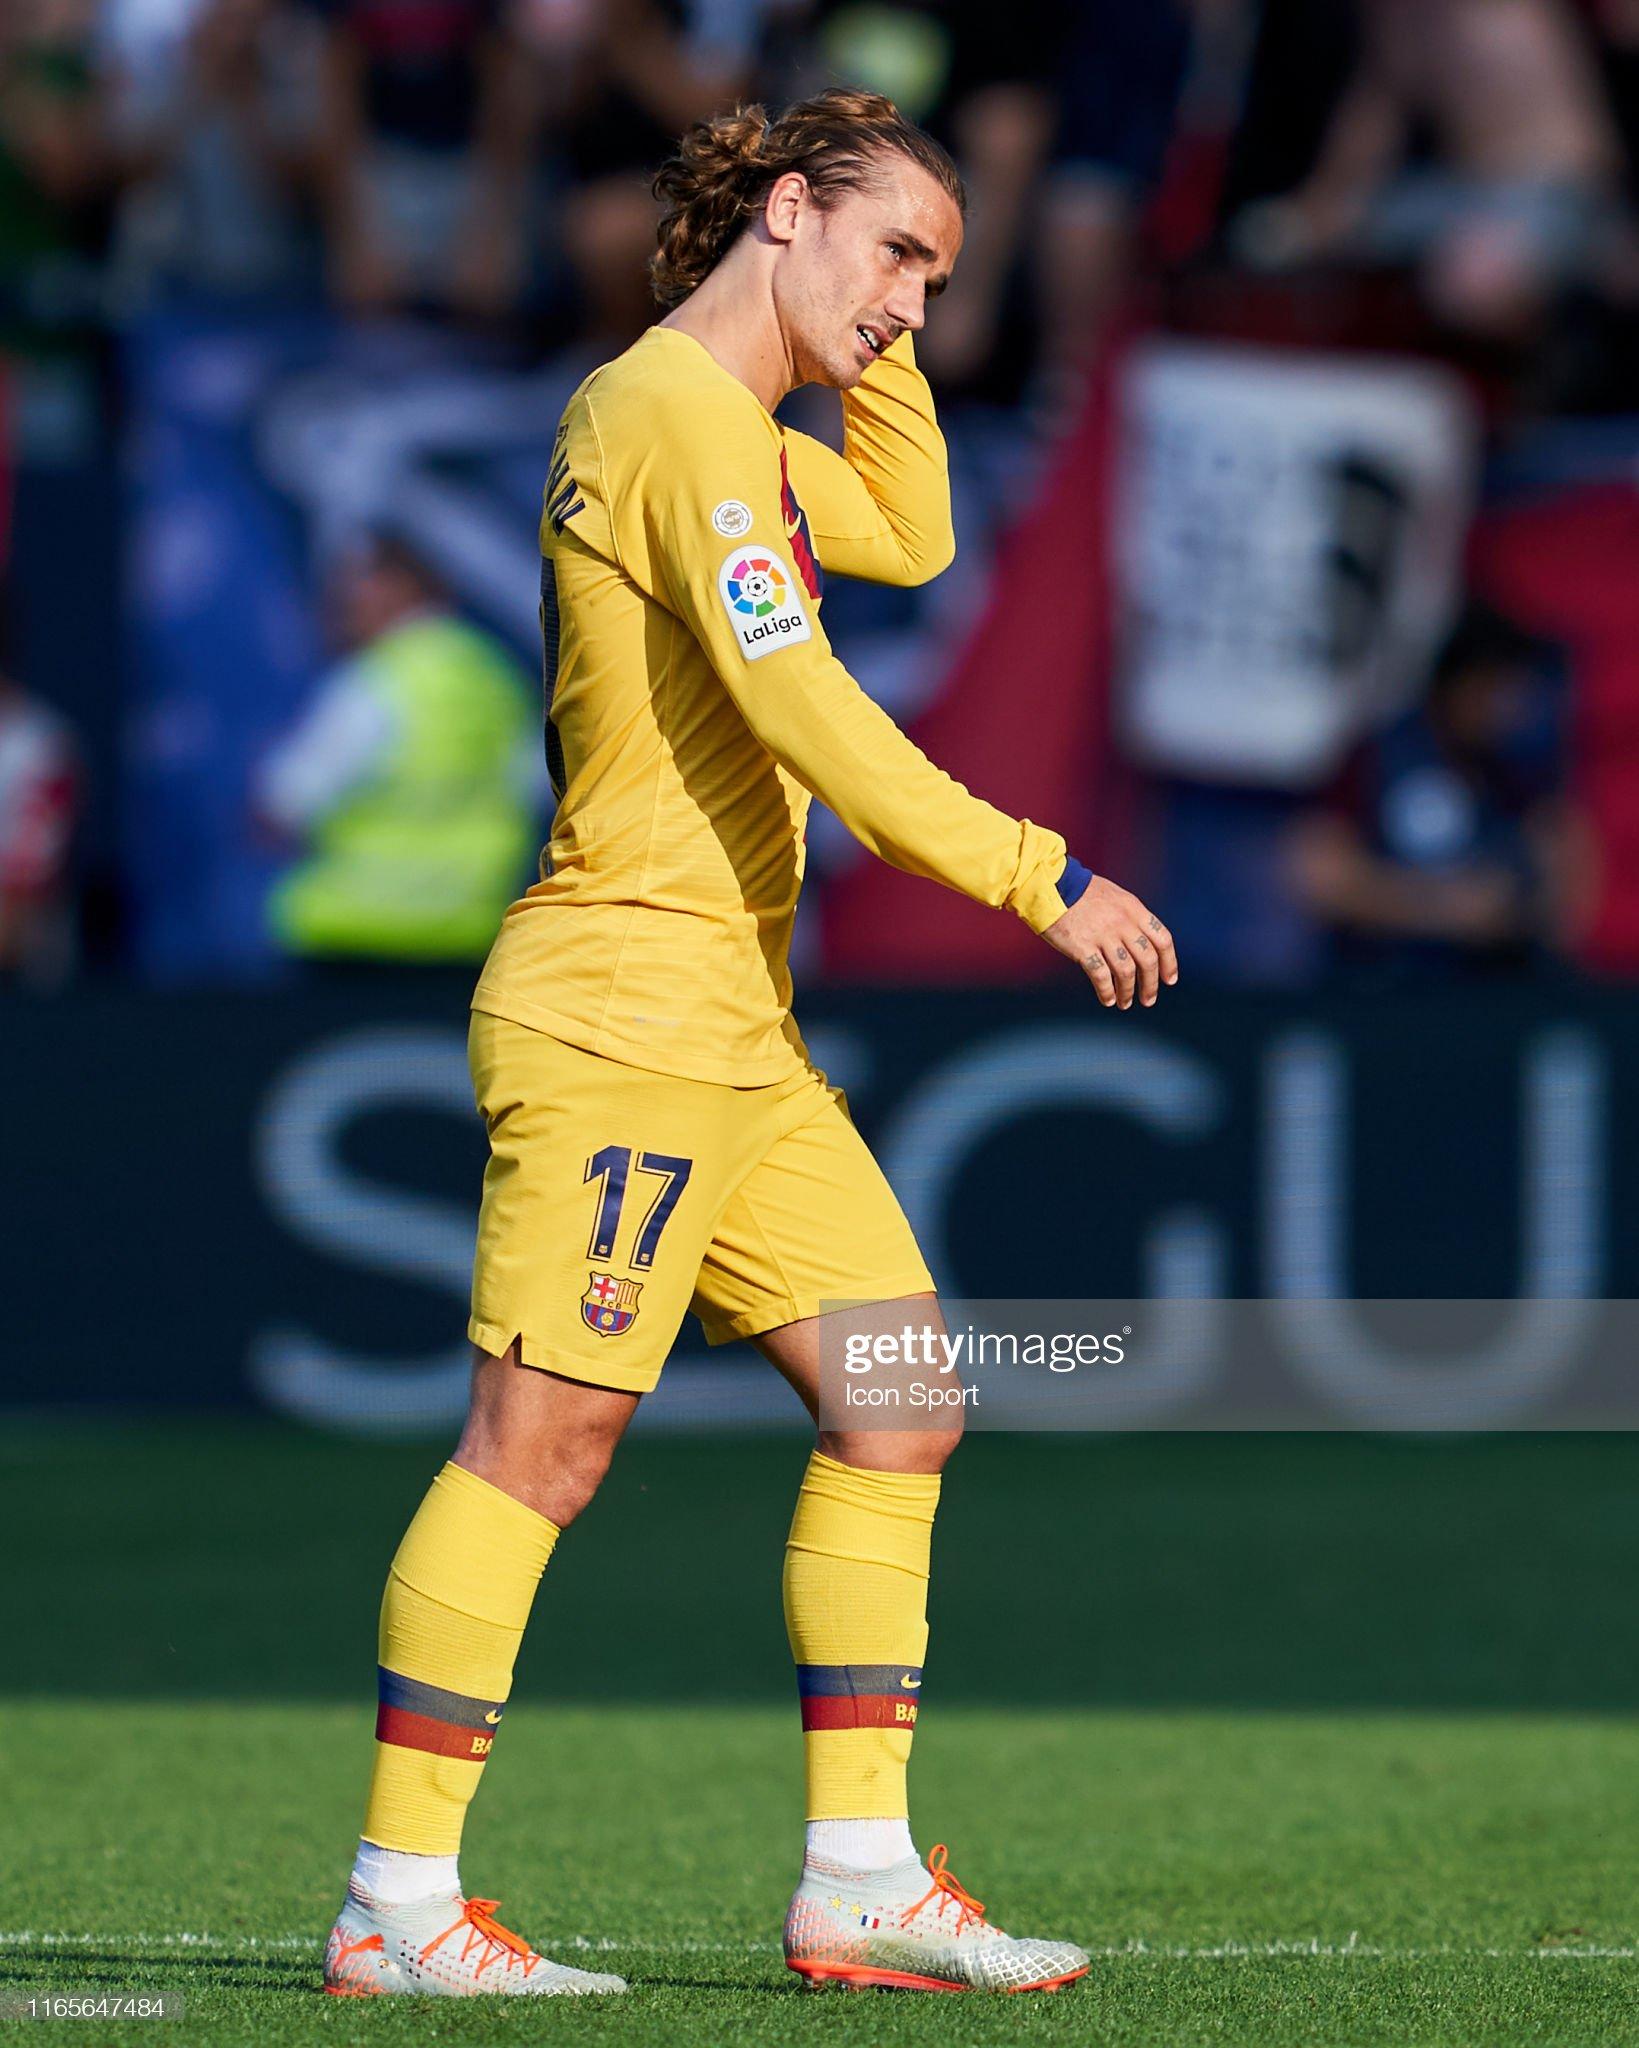 صور مباراة : أوساسونا - برشلونة 2-2 ( 31-08-2019 )  Antoine-griezmann-of-fc-barcelona-during-the-liga-match-between-and-picture-id1165647484?s=2048x2048